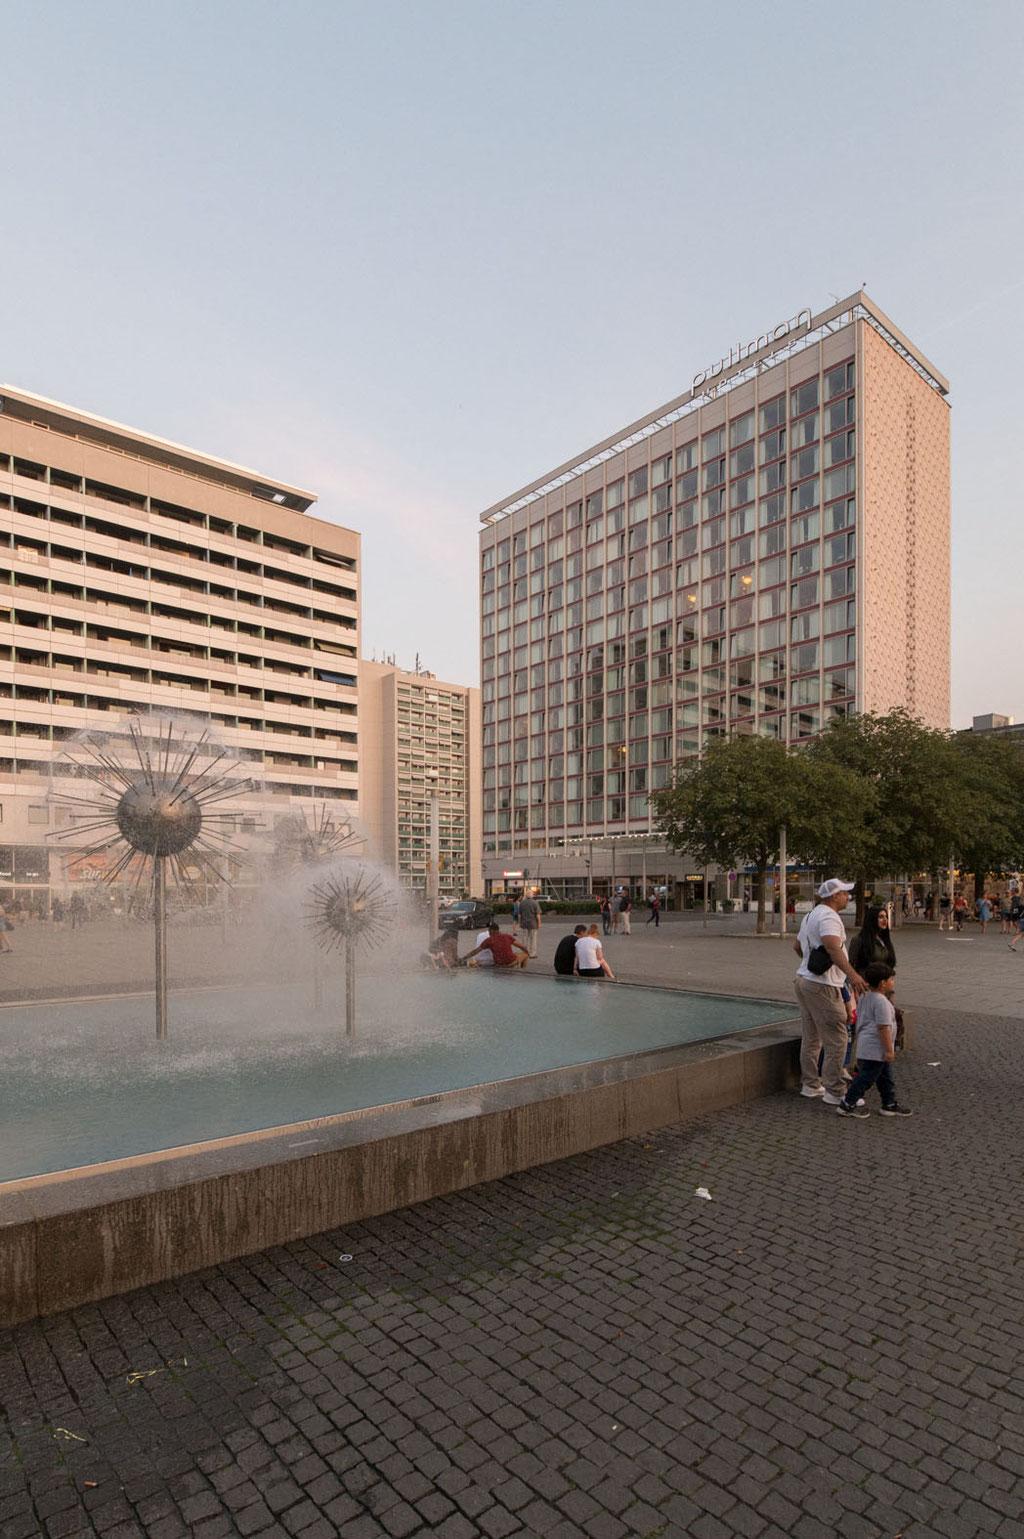 Interhotel Newa (Claus Kaiser, Manfred Arlt, Hans Fuhrmann, Jochen Weinert), heute Hotel Pullman, Prager Strasse, Dresden (D)